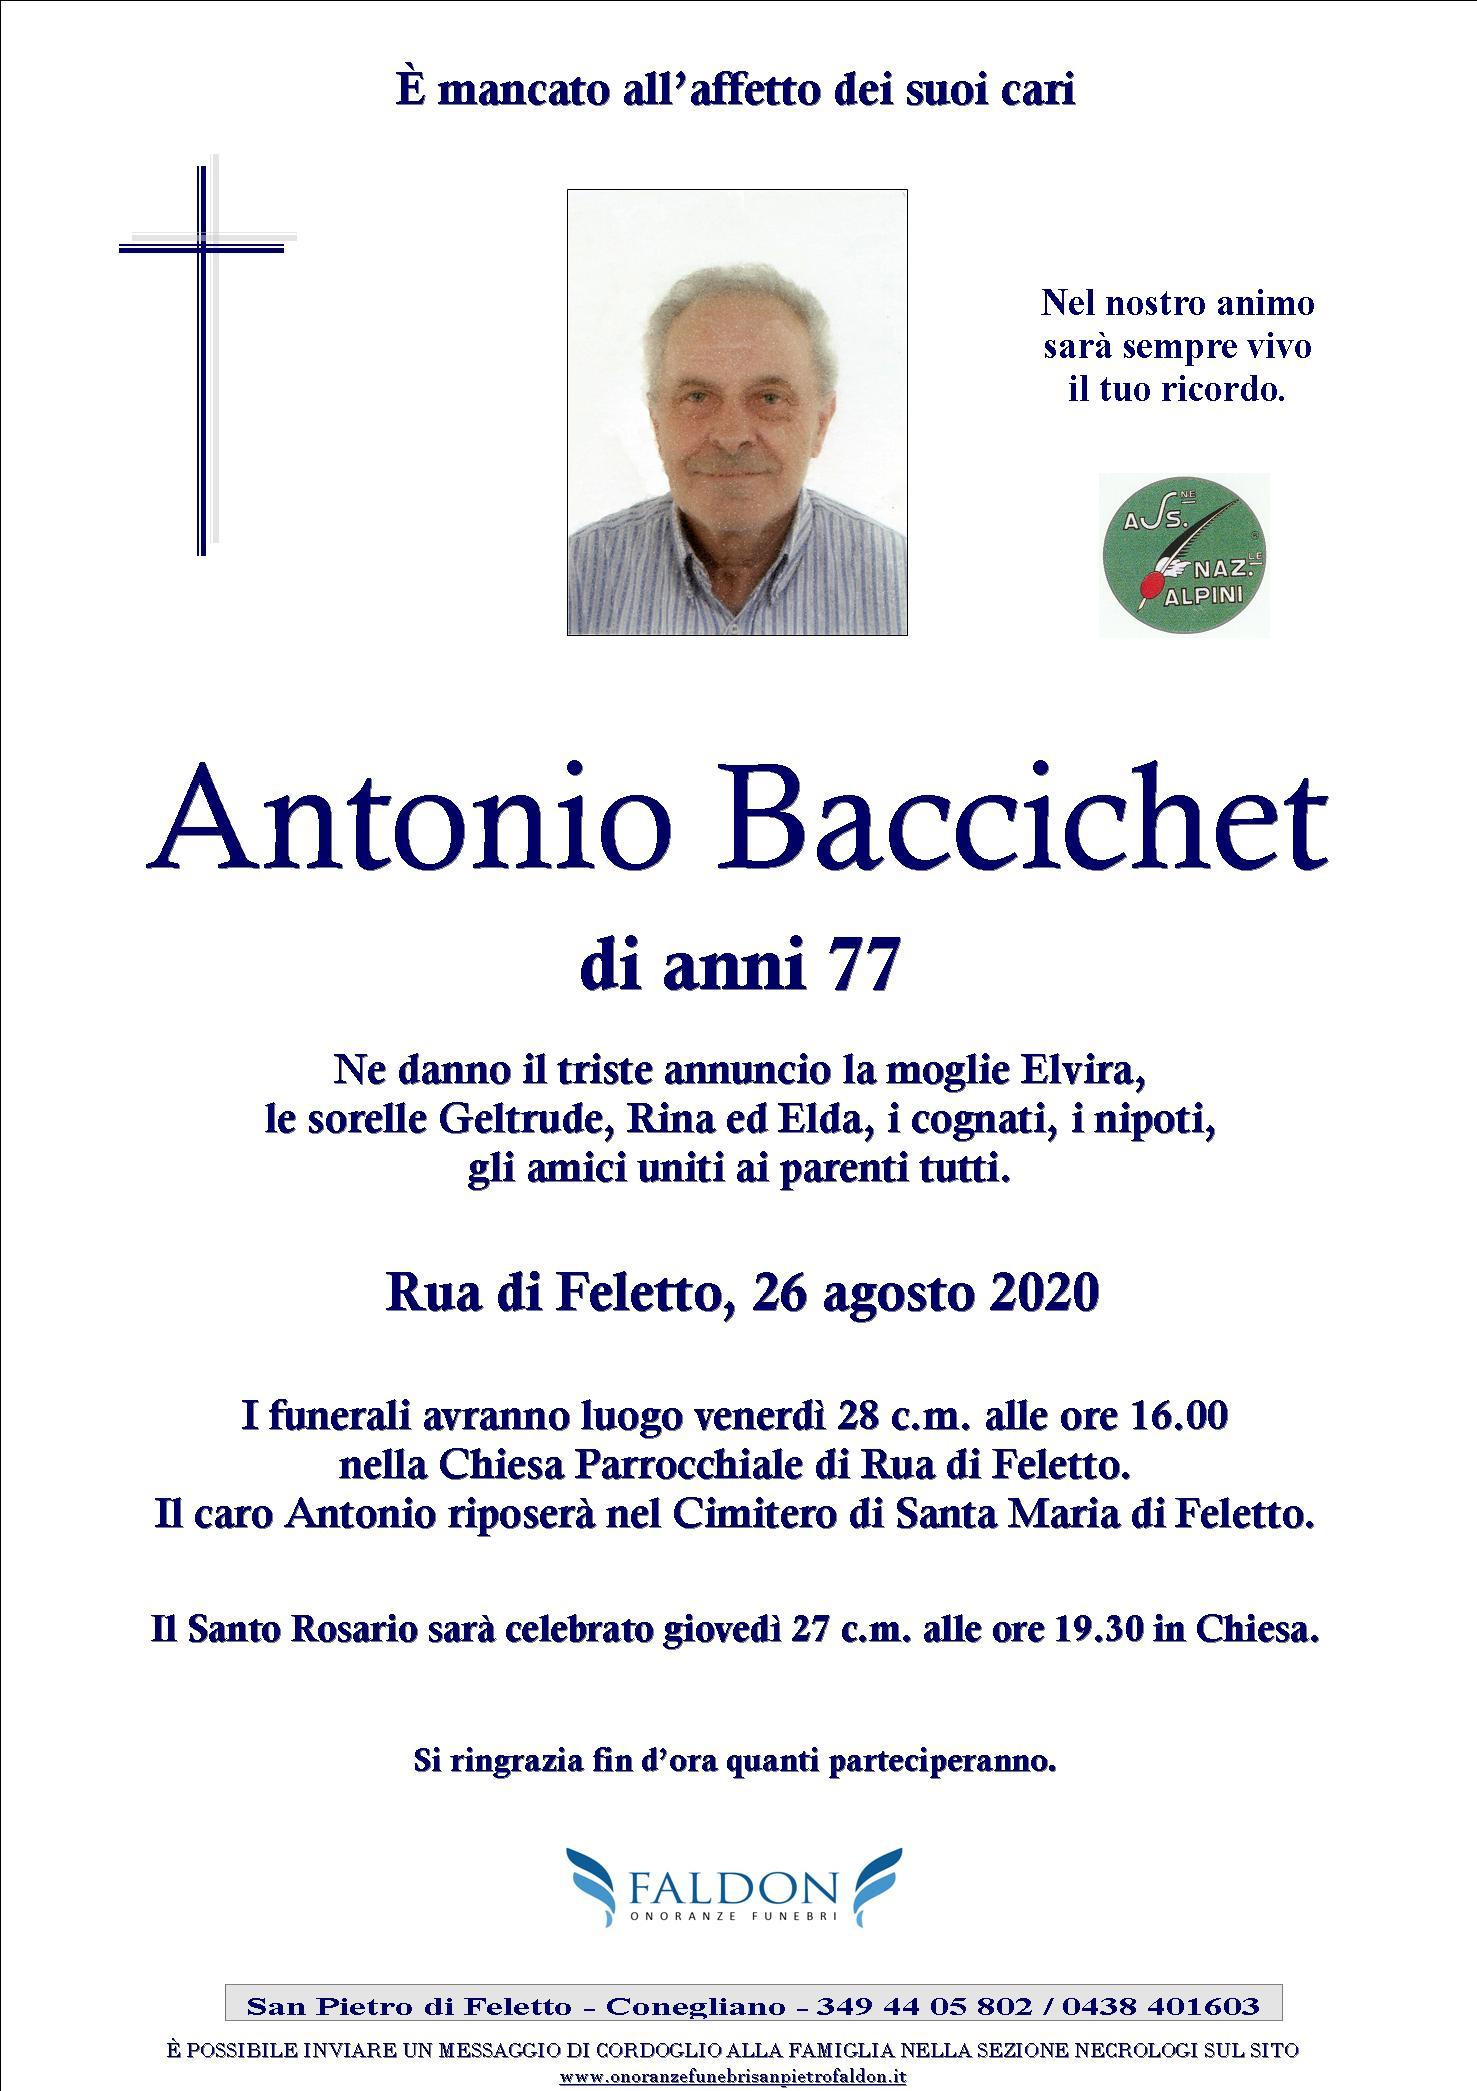 Antonio Baccichet